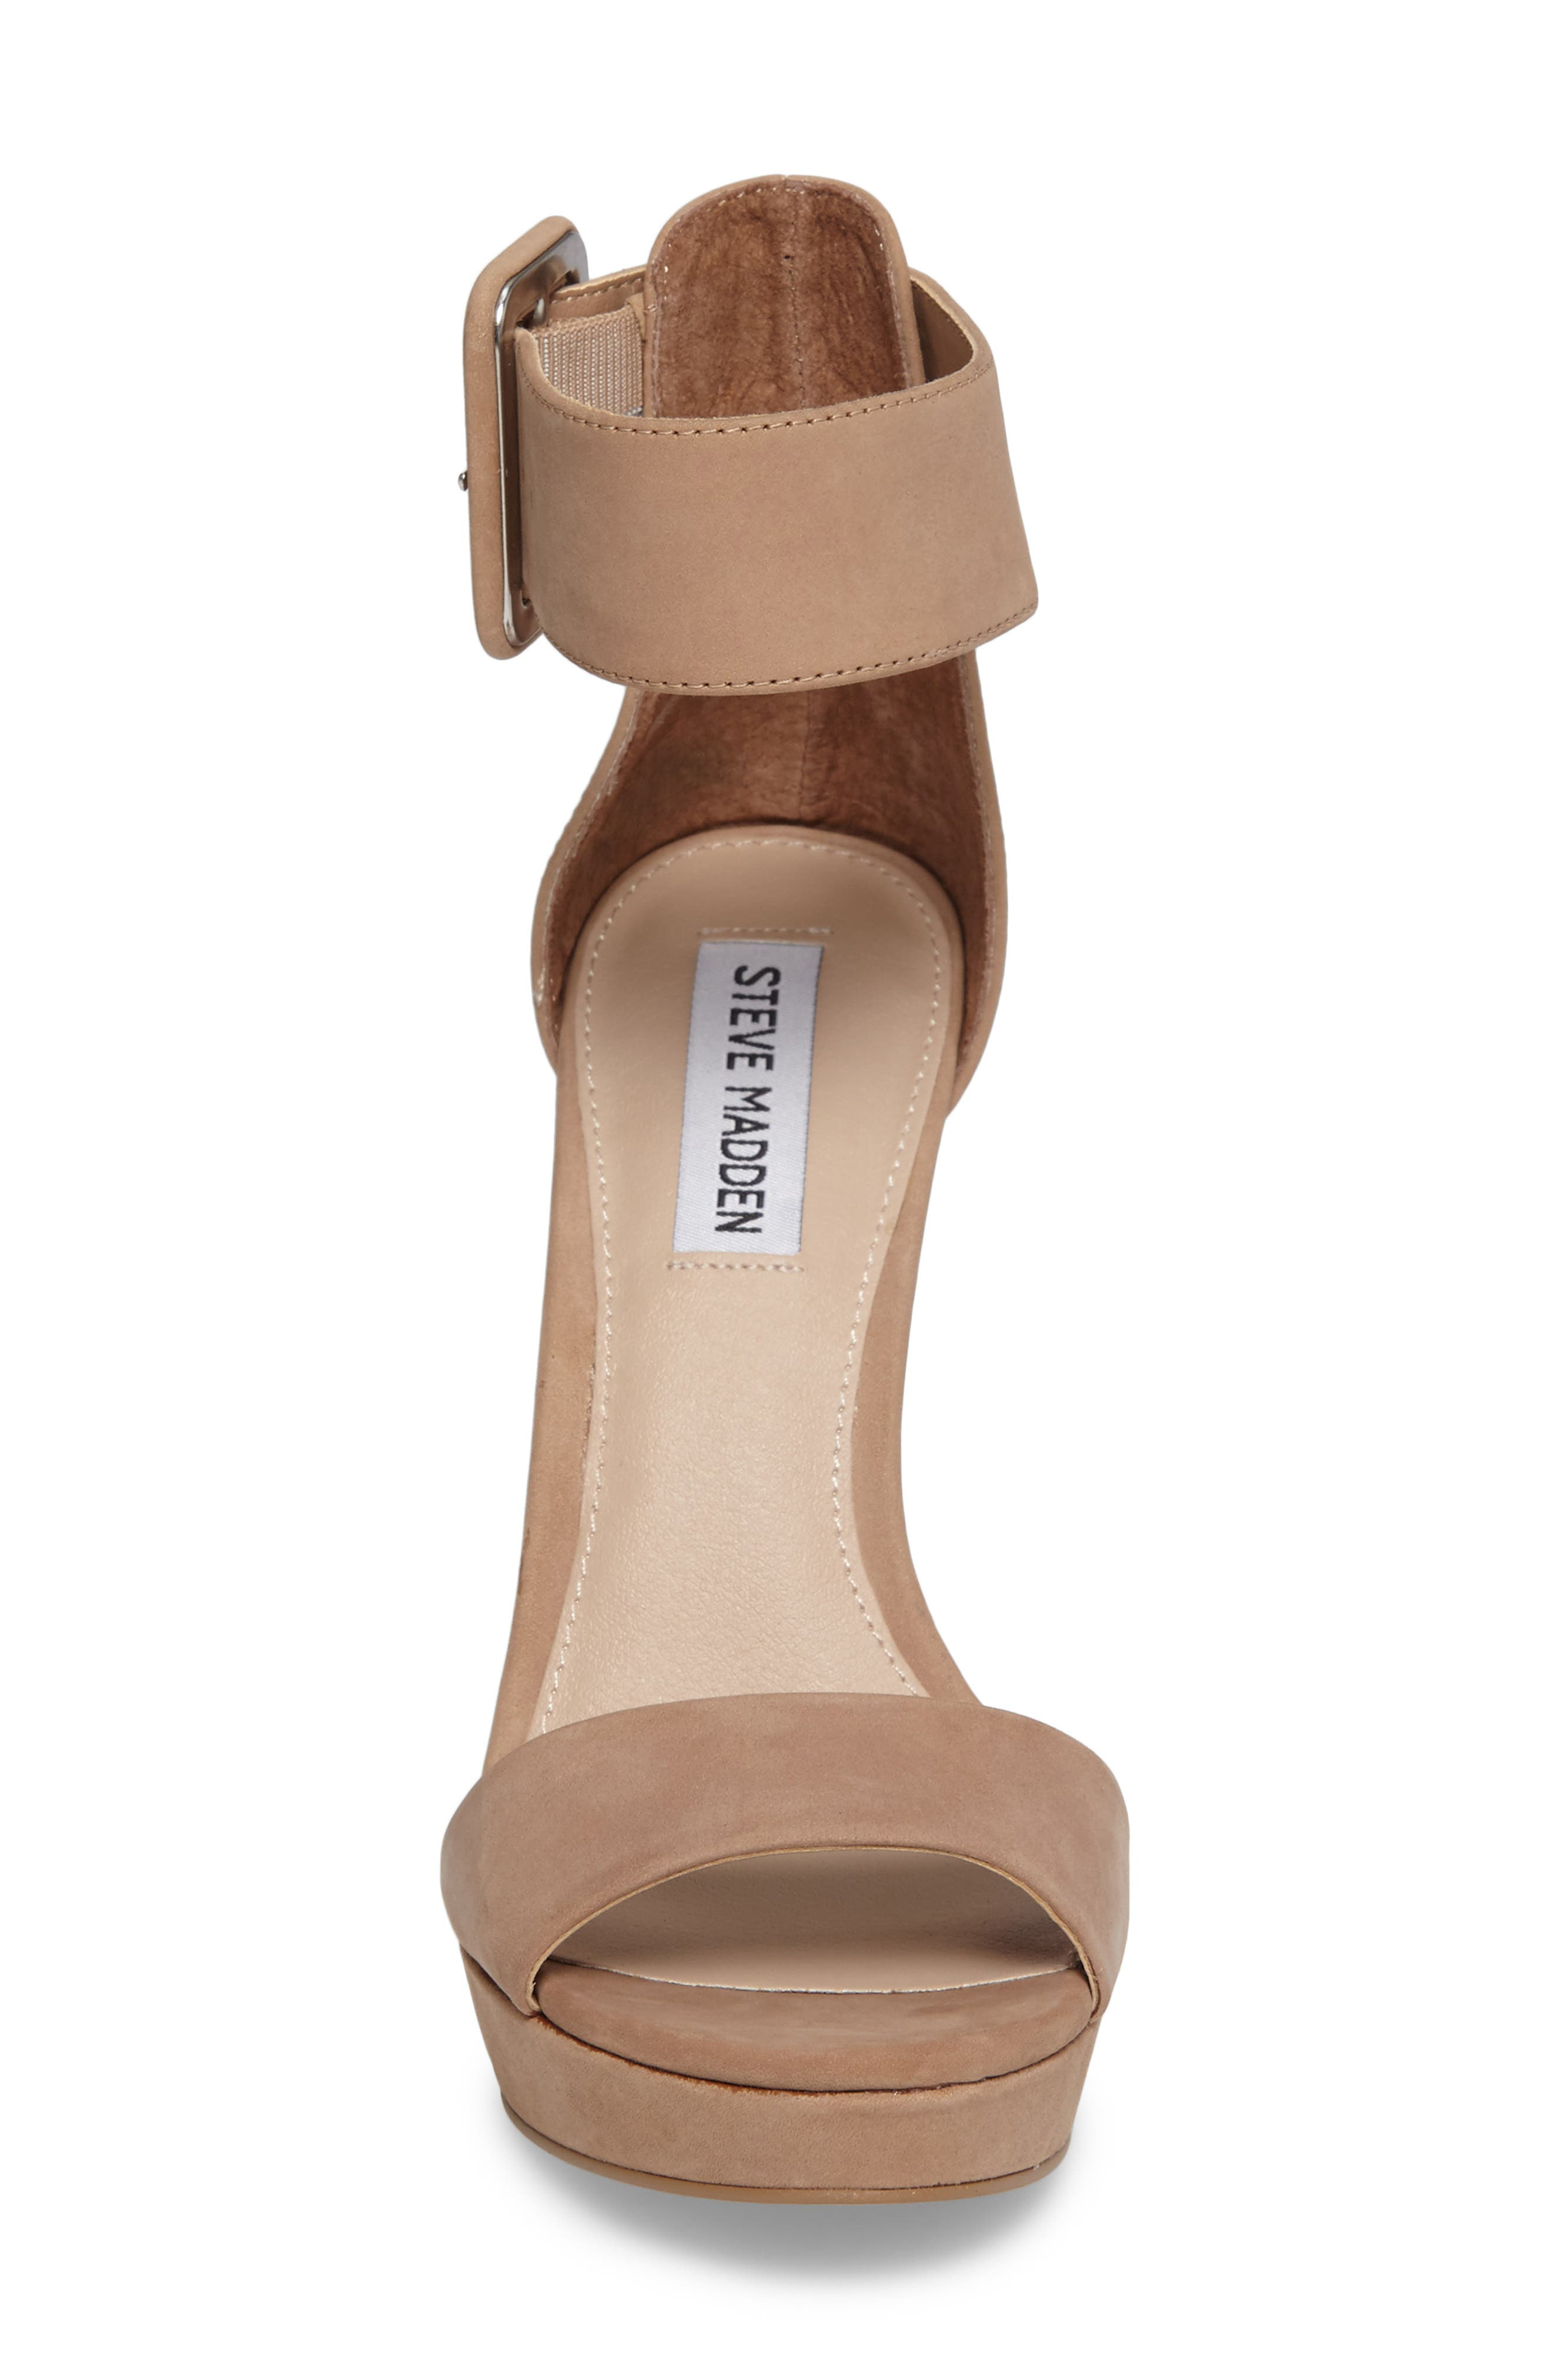 Circuit Sandal,                             Alternate thumbnail 5, color,                             Tan Nubuck Leather